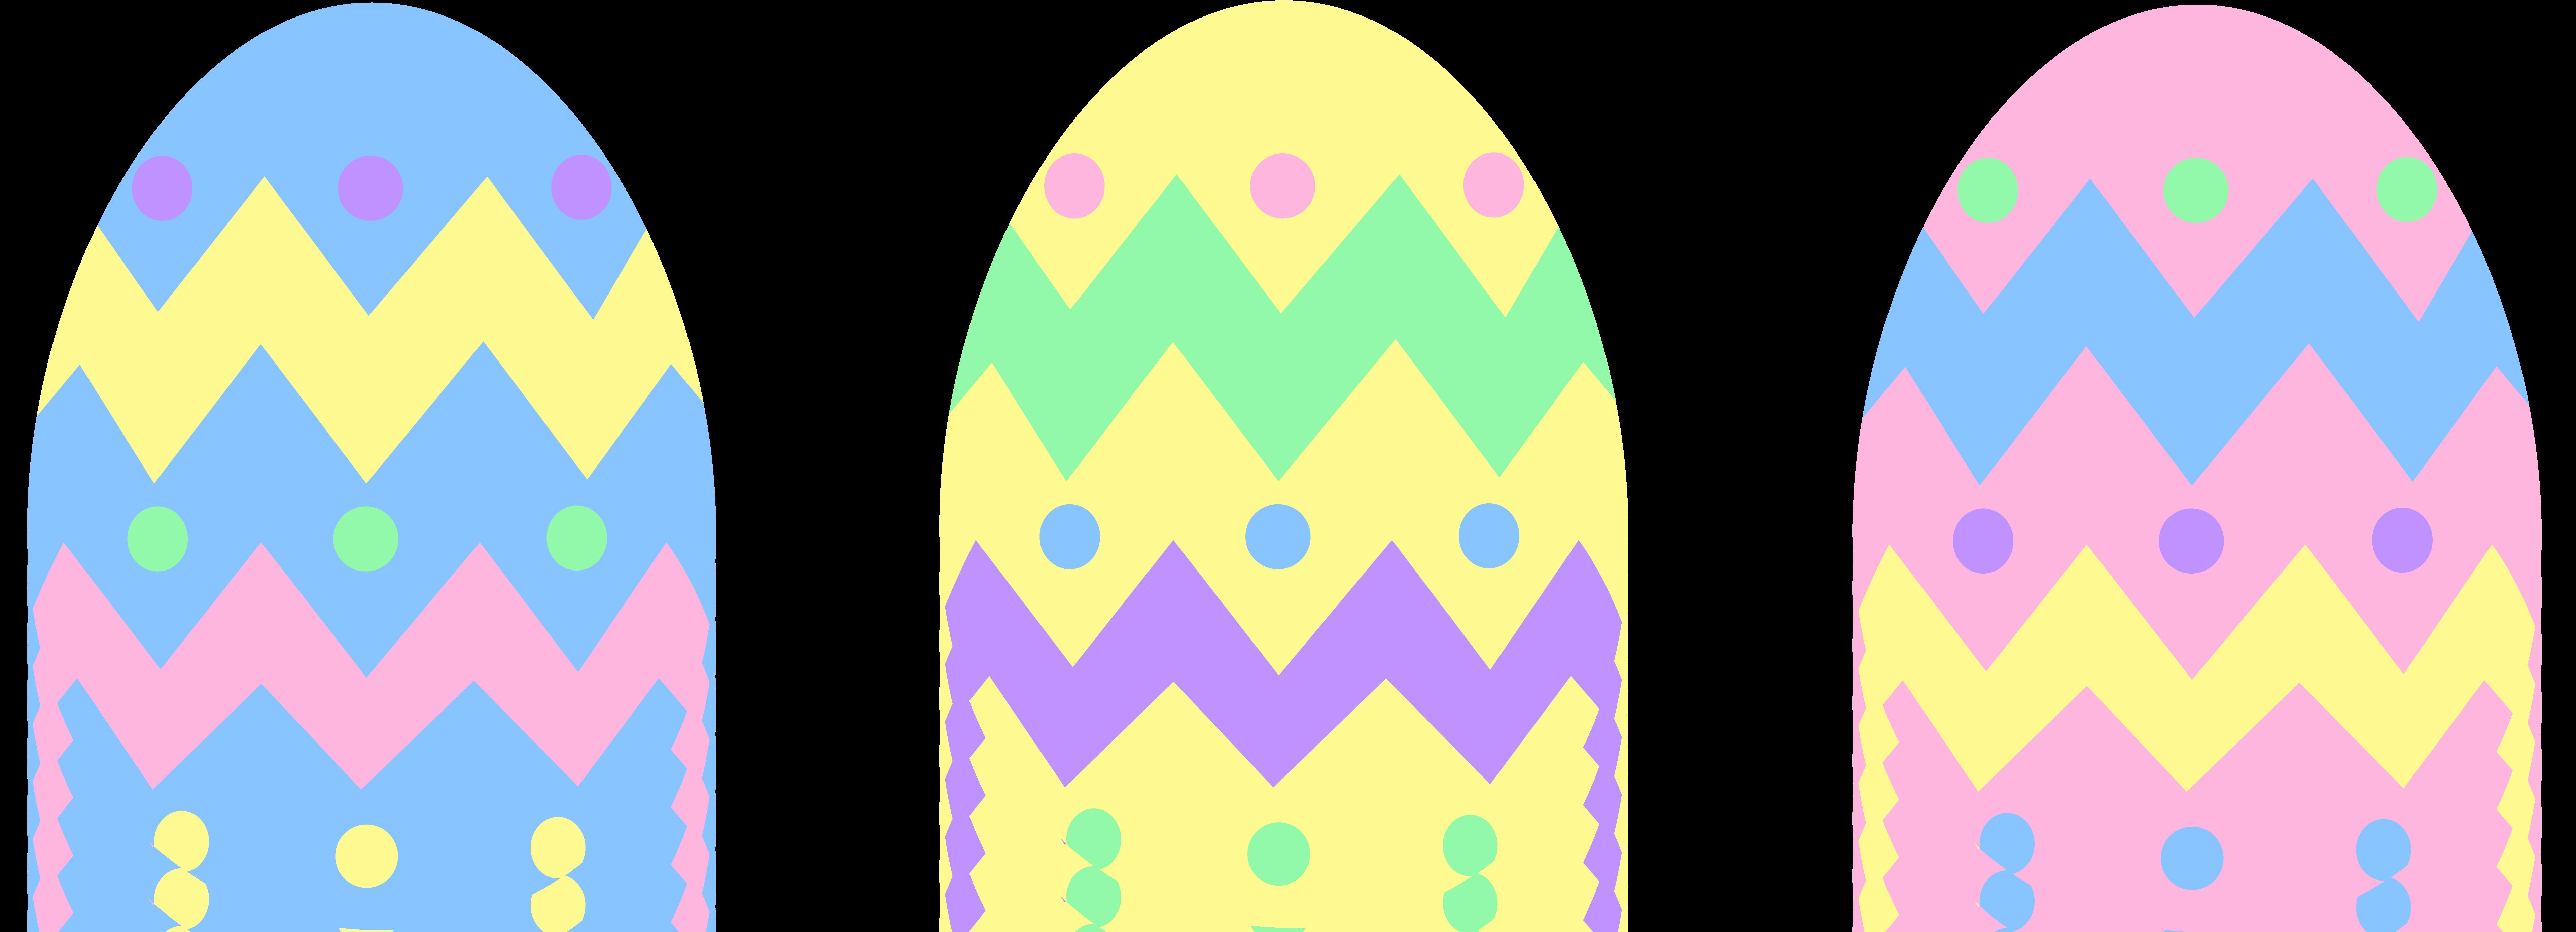 7655x2769 Pastel Easter Egg Clipart